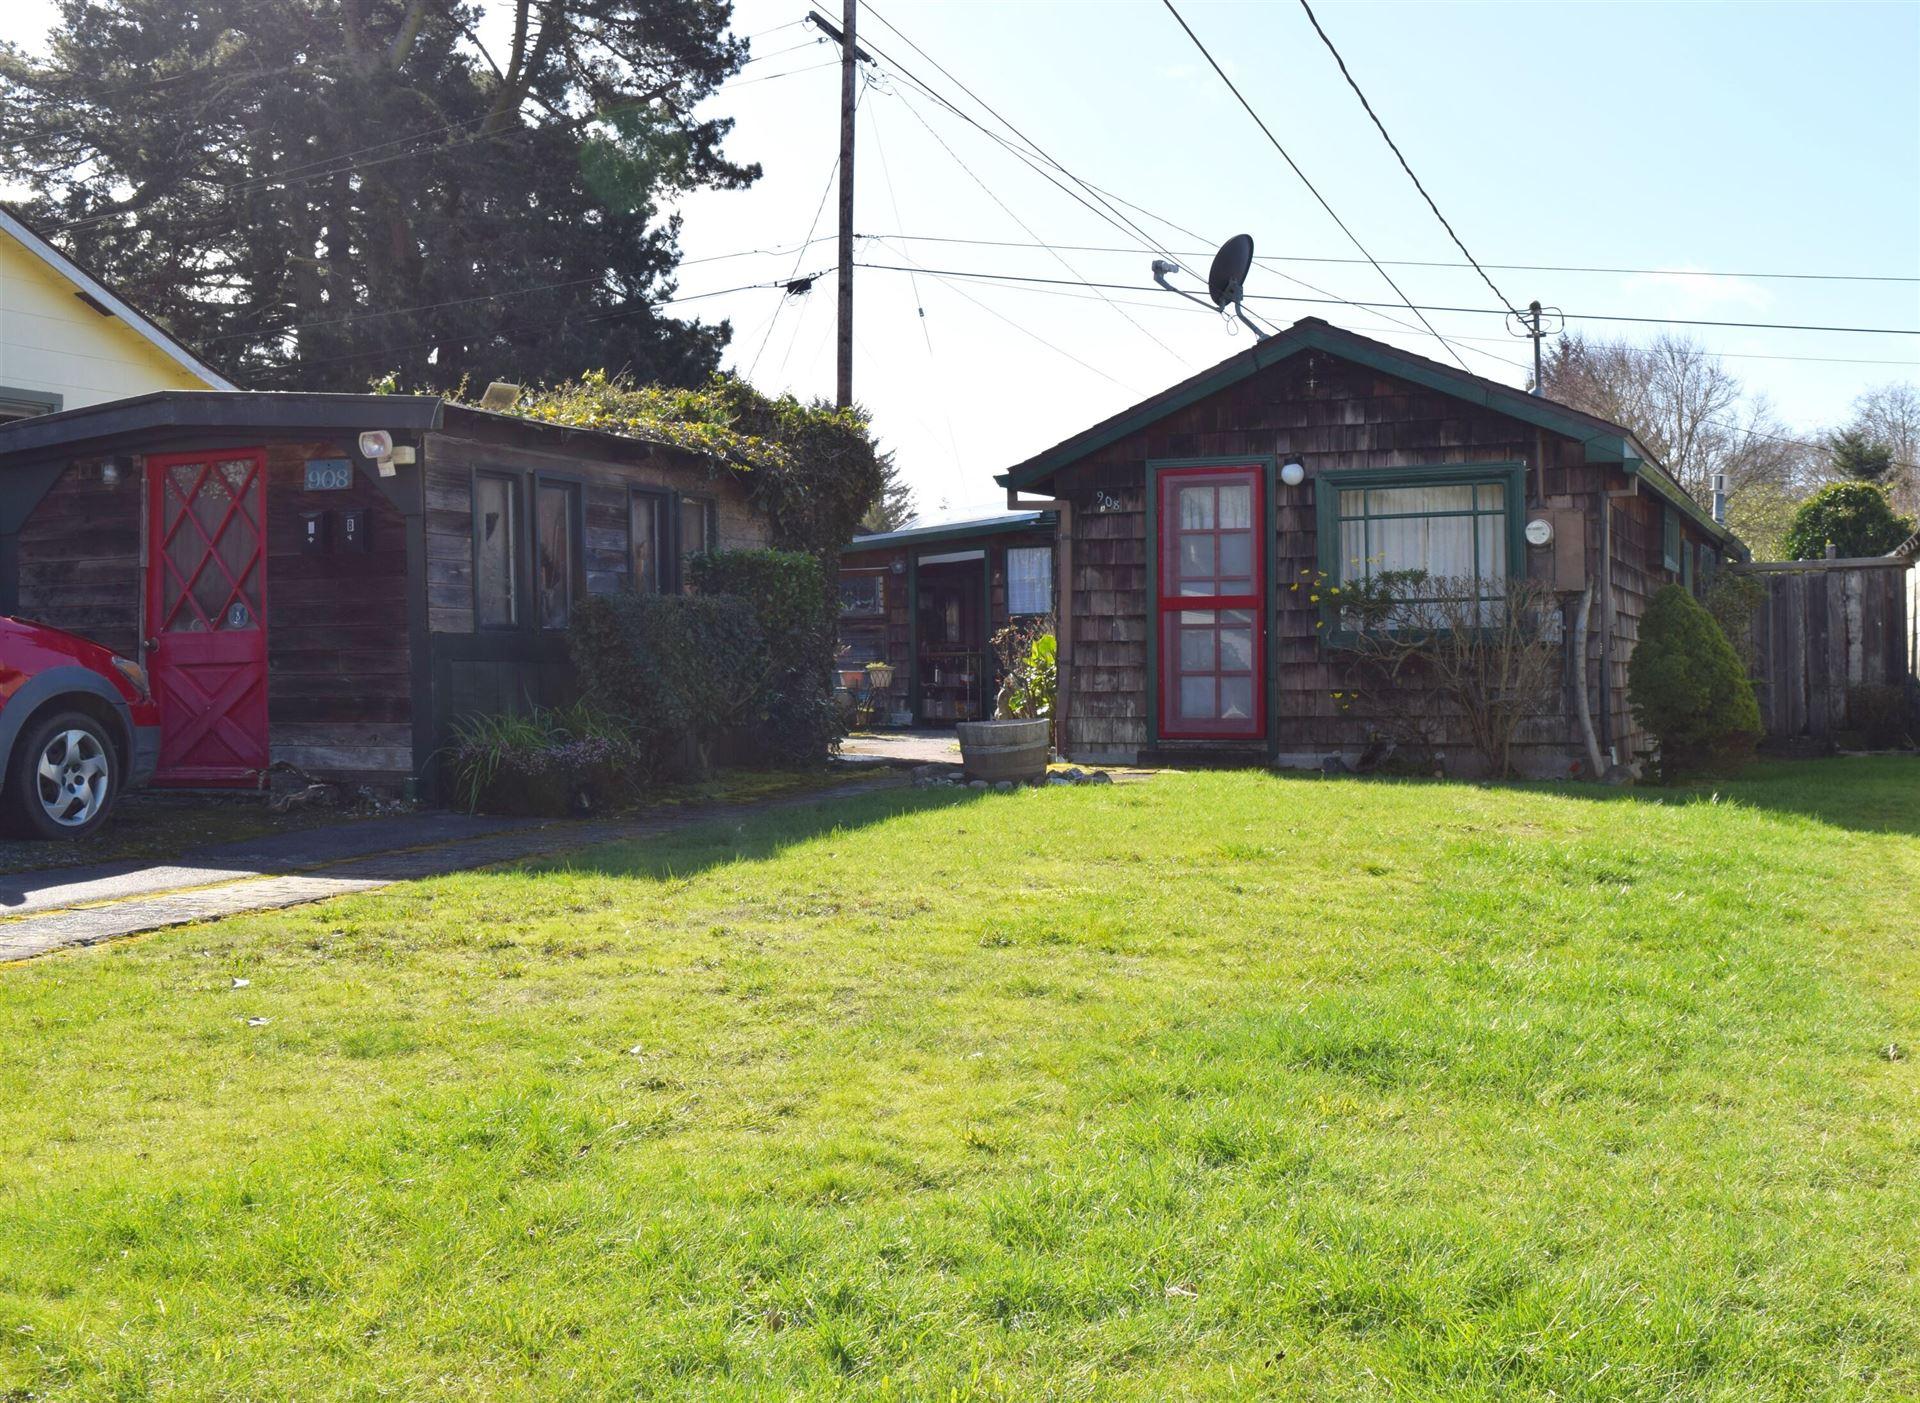 908 S Street, Eureka, CA 95501 - MLS#: 258390